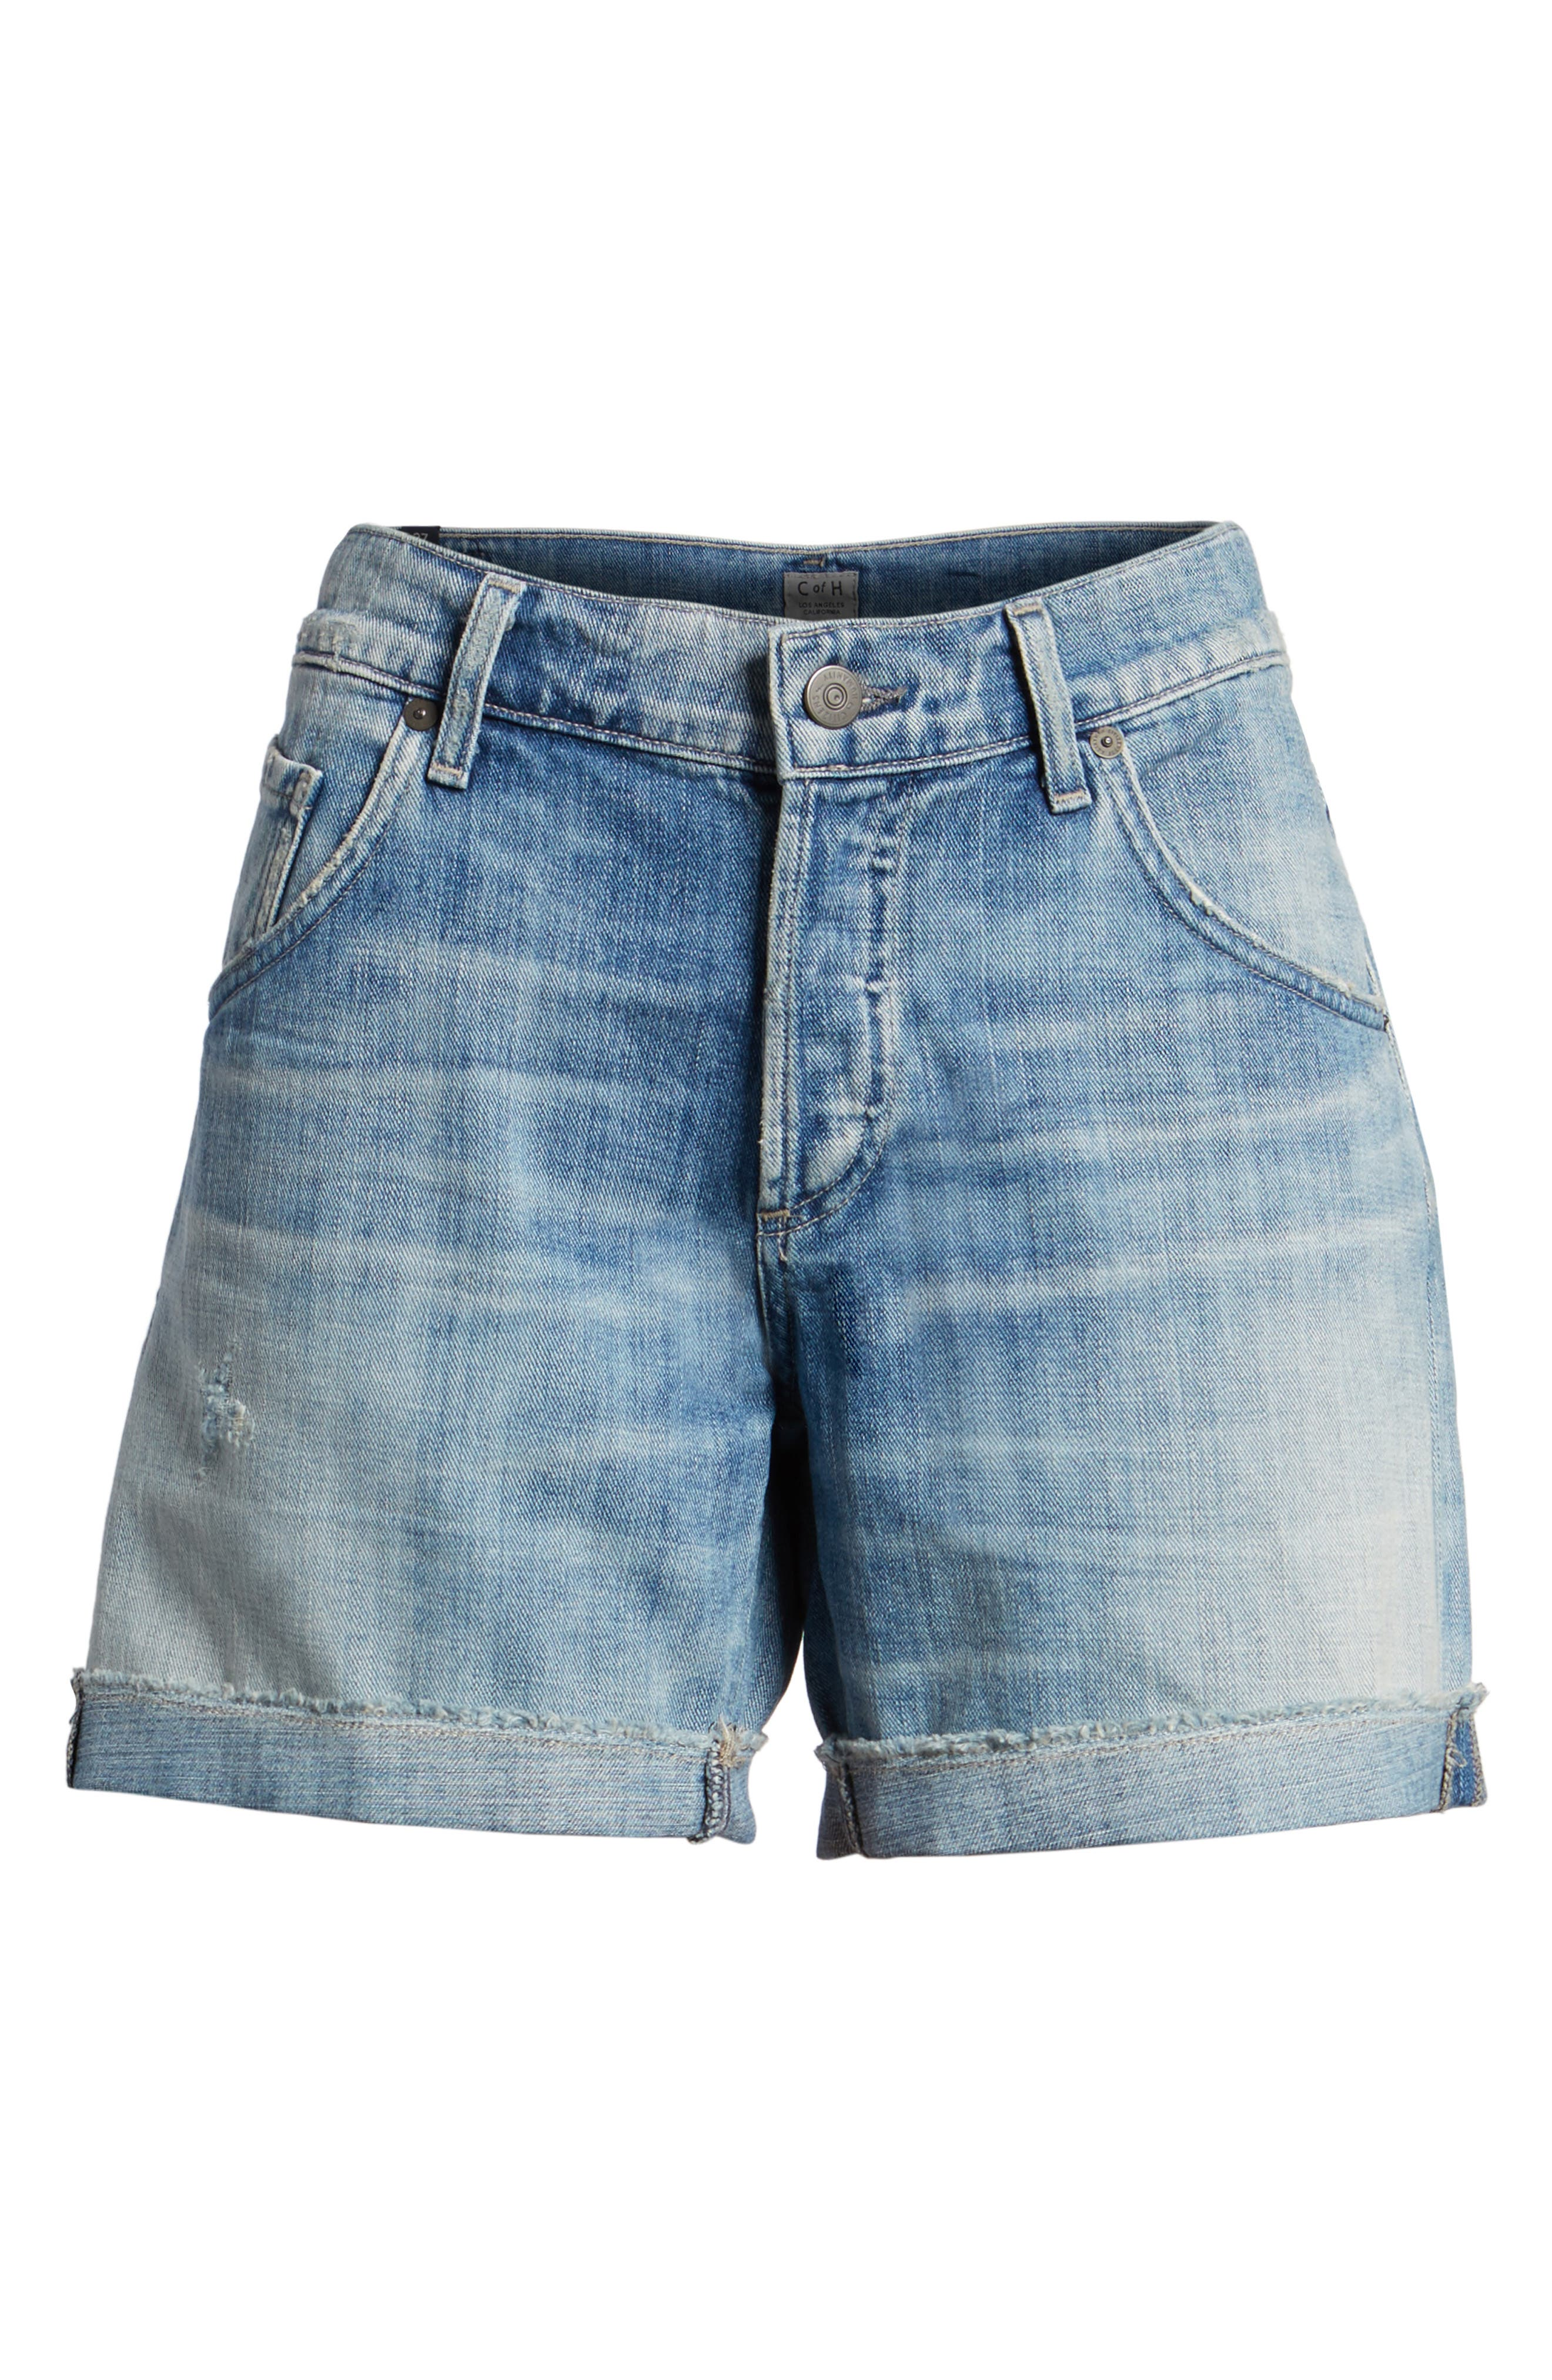 'Skler' Denim Shorts,                             Main thumbnail 1, color,                             451